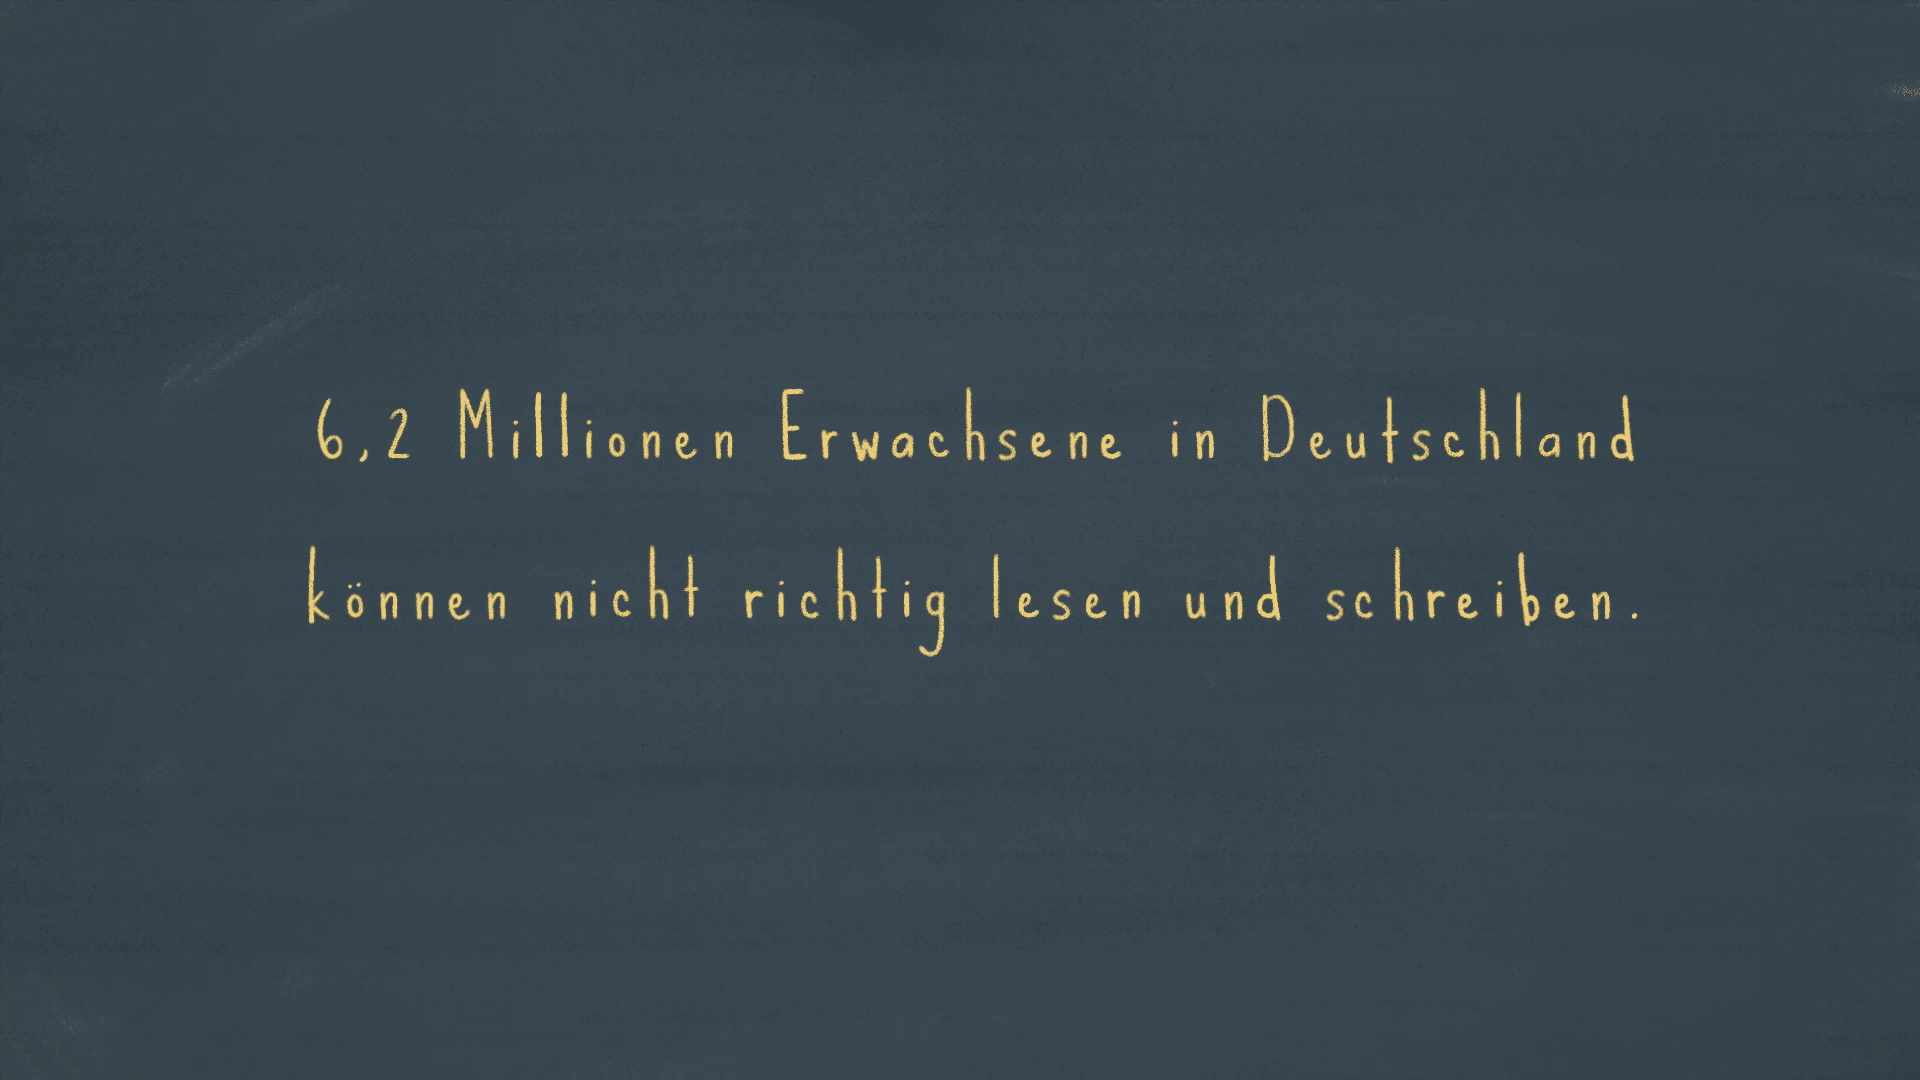 Stiftung Lesen ErklärvideoStiftung Lesen ErklärvideoStiftung Lesen Erklärvideo